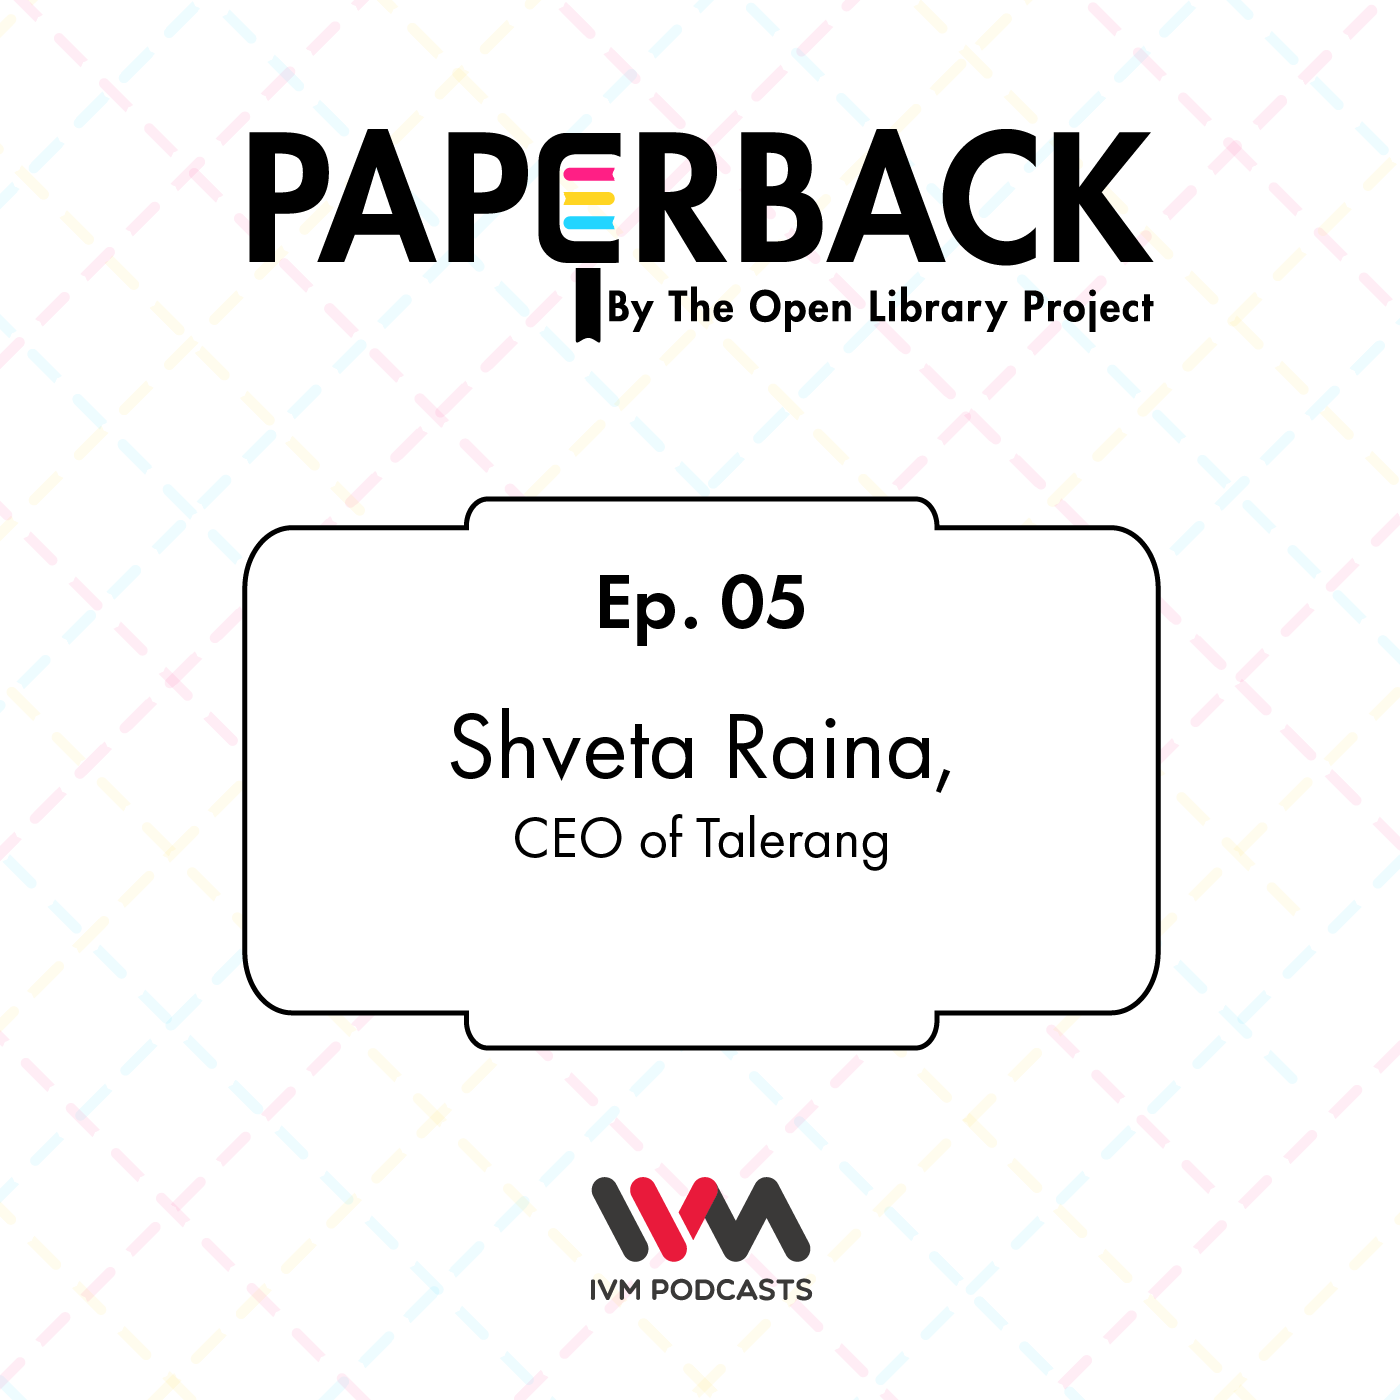 Ep. 05: Shveta Raina